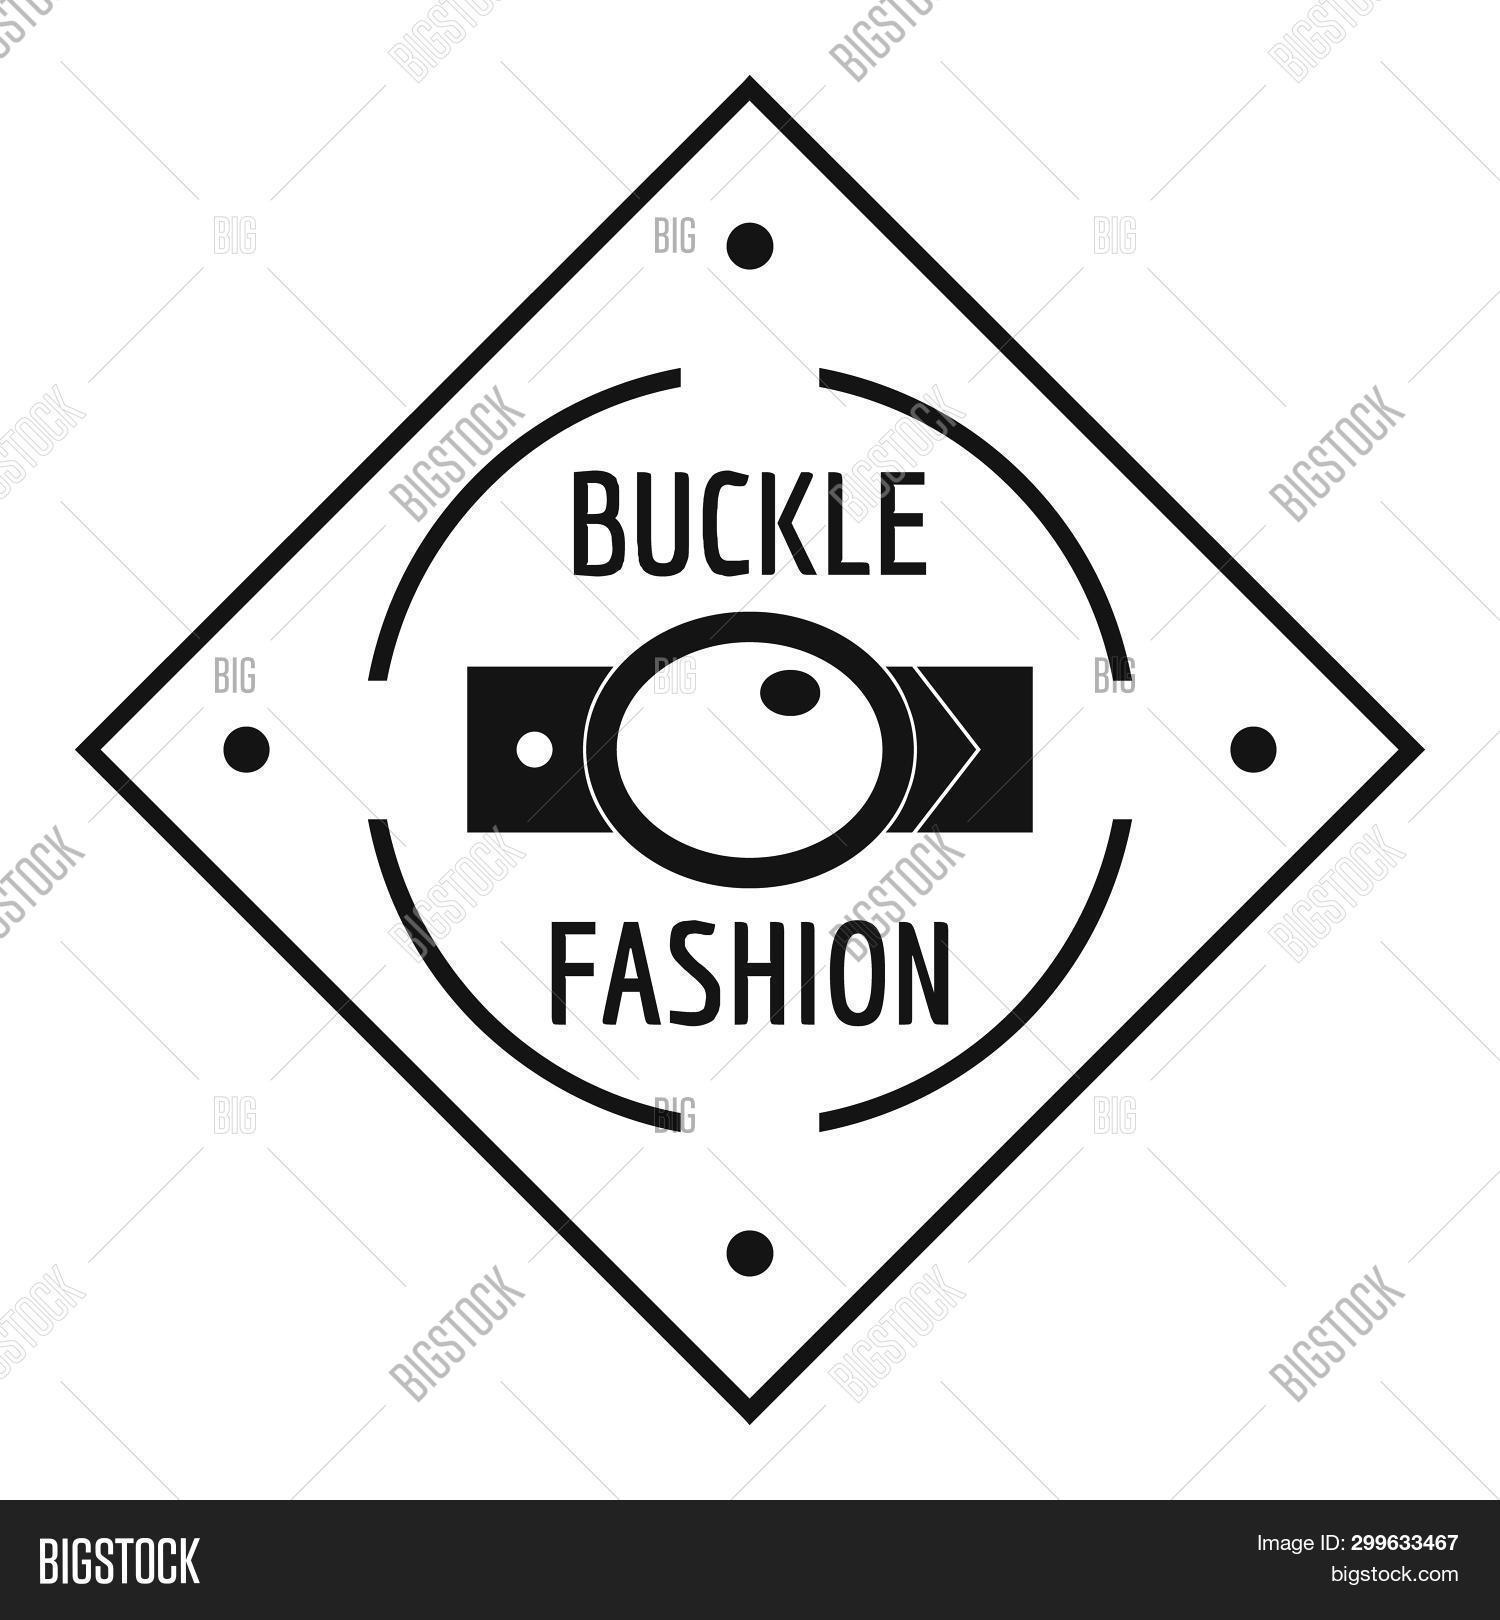 Buckle Chrome Logo. Simple Illustration Of Buckle Chrome Logo For Web